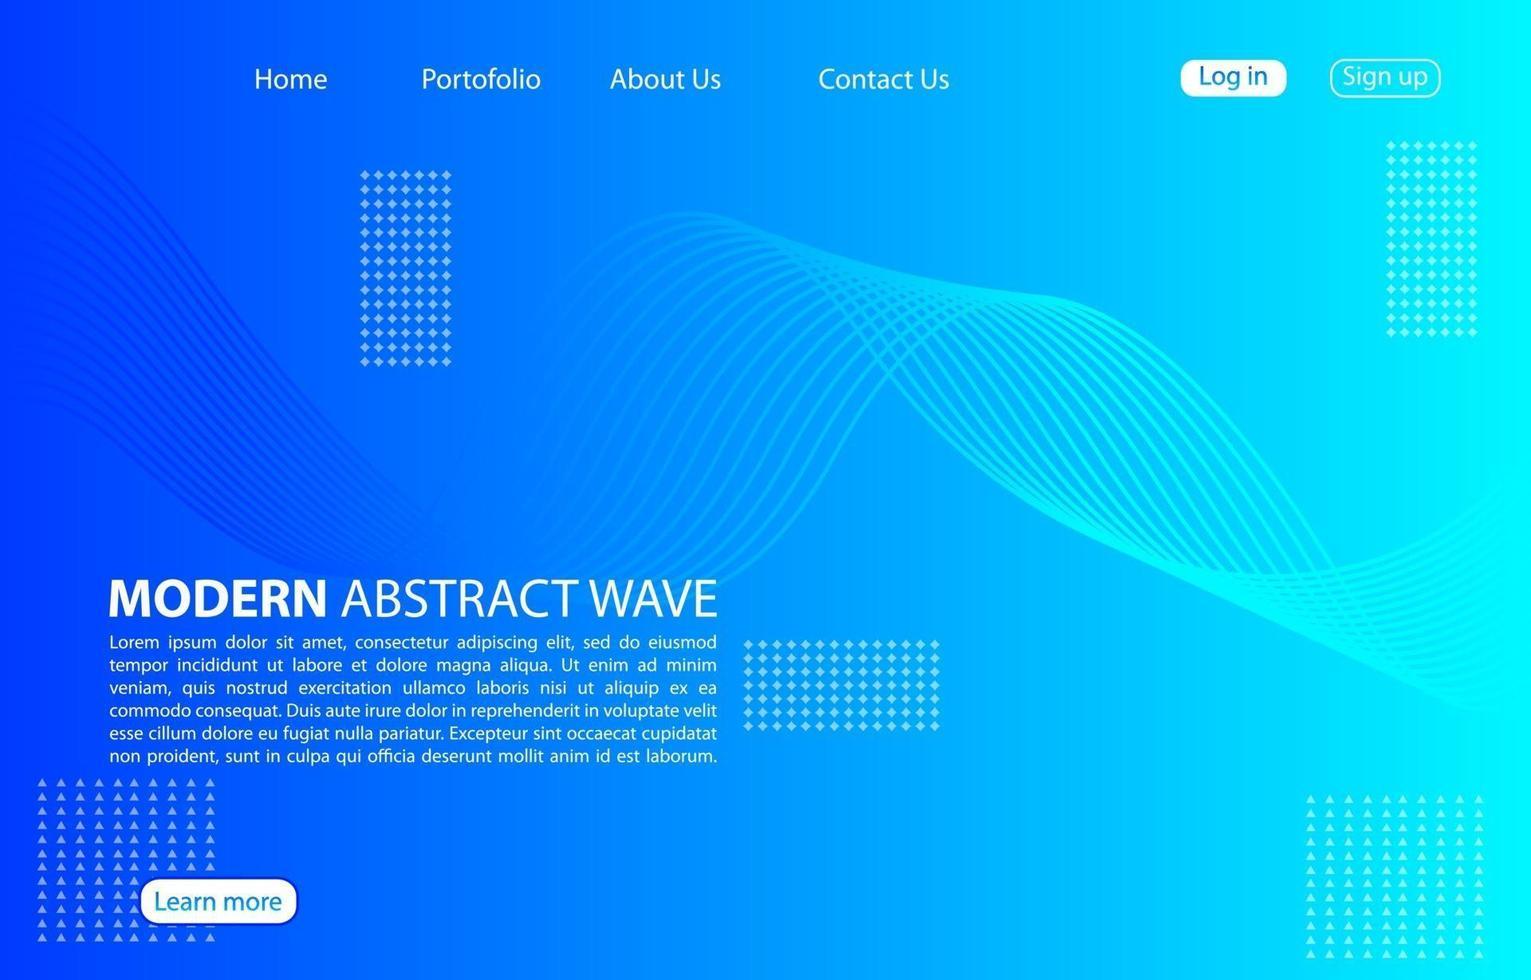 moderne abstrakte Welle background.landing page abstrakte Welle design.blue Vorlage Apps und Websites. vektor